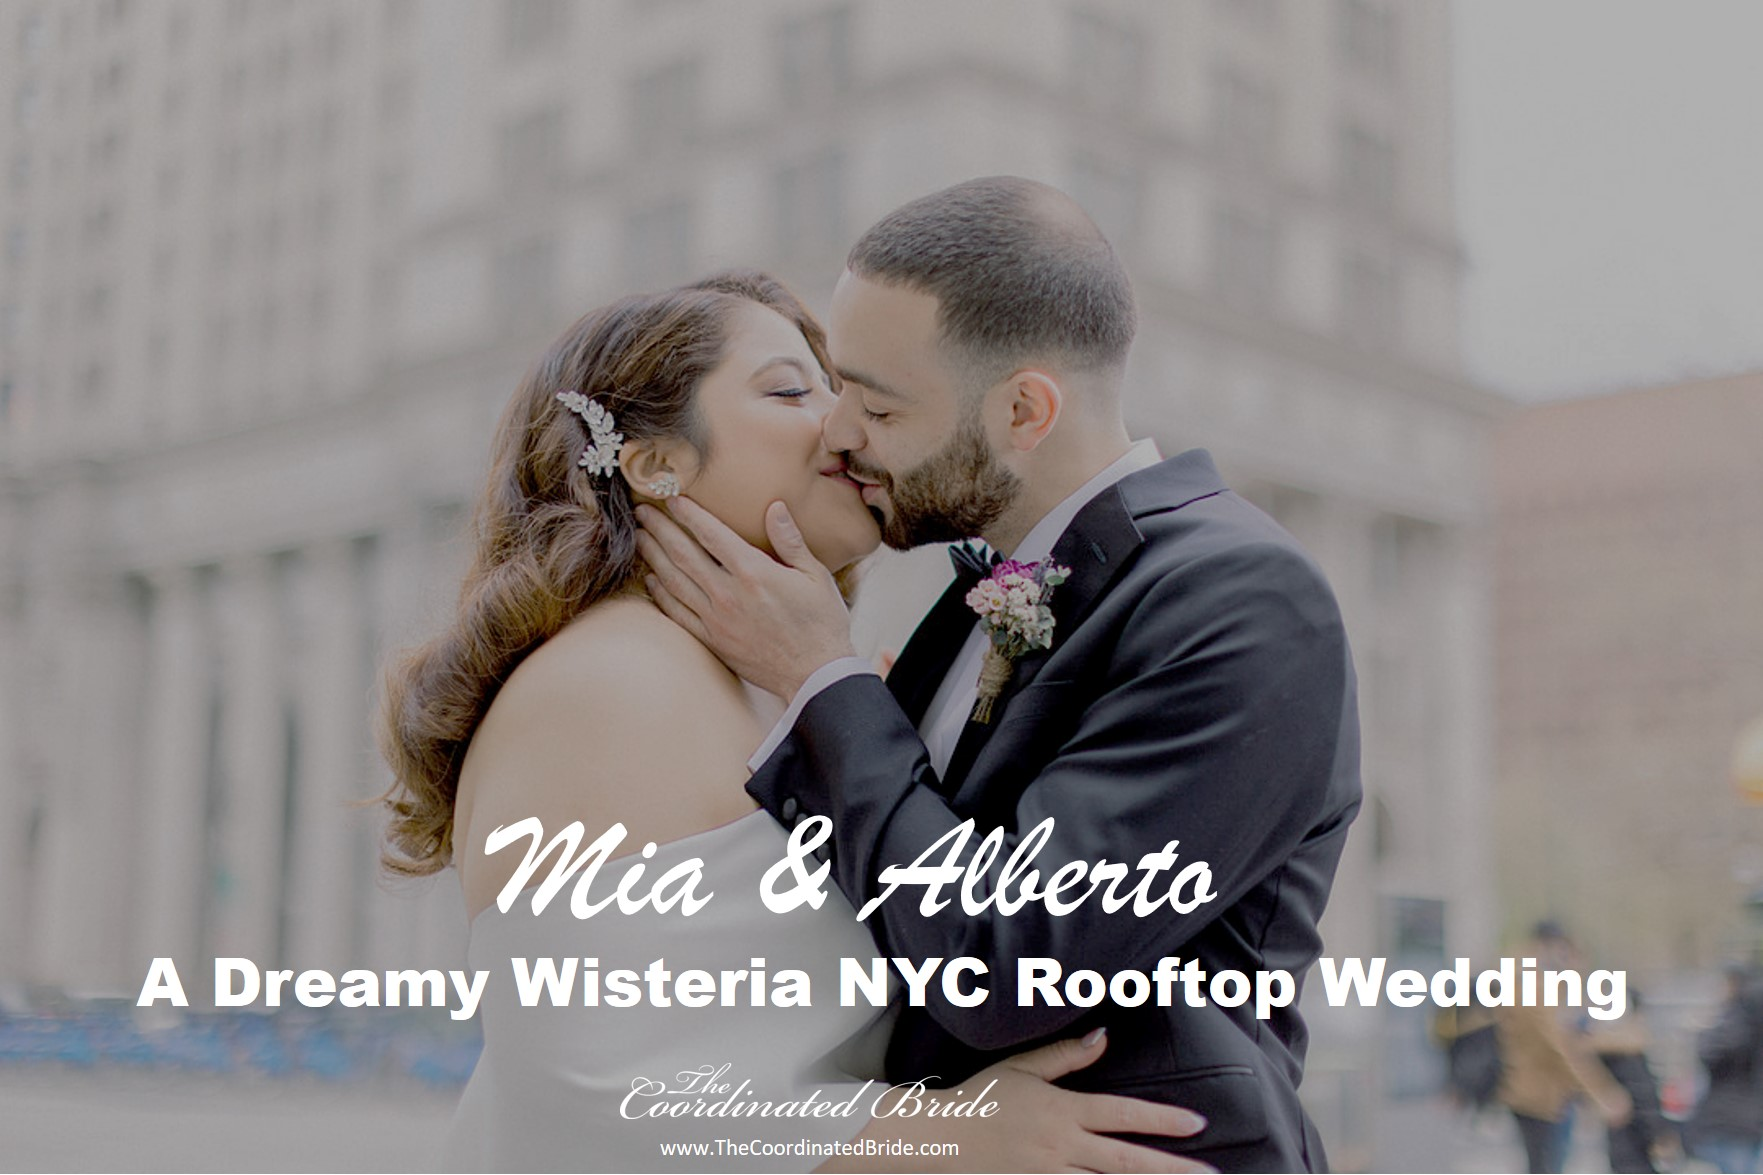 Dreamy Wisteria New York City Rooftop Wedding